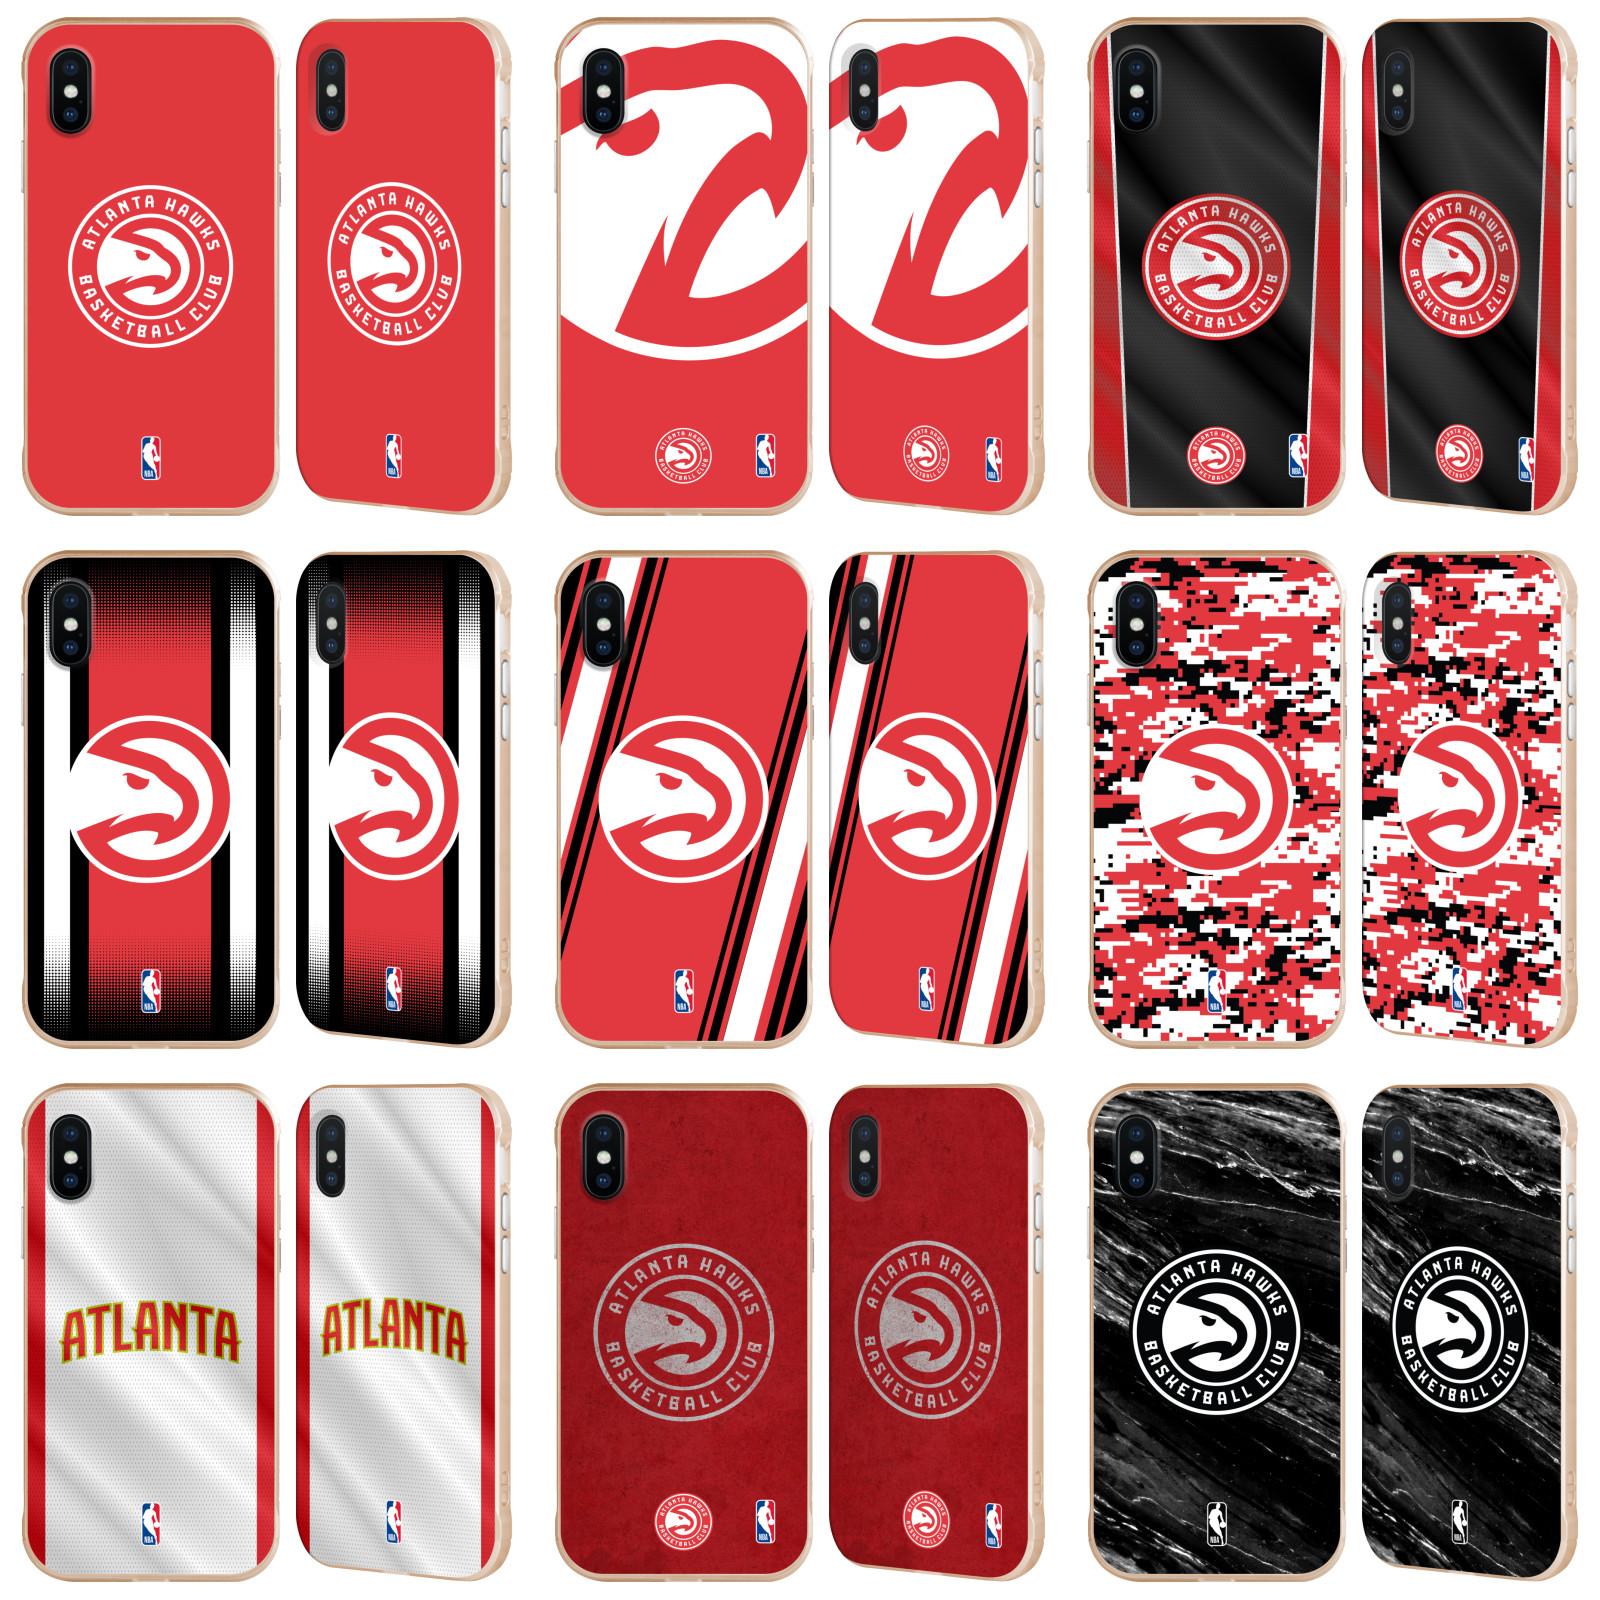 6eb9f98fa72 OFFICIAL NBA ATLANTA HAWKS GOLD FENDER CASE FOR APPLE iPHONE PHONES ...